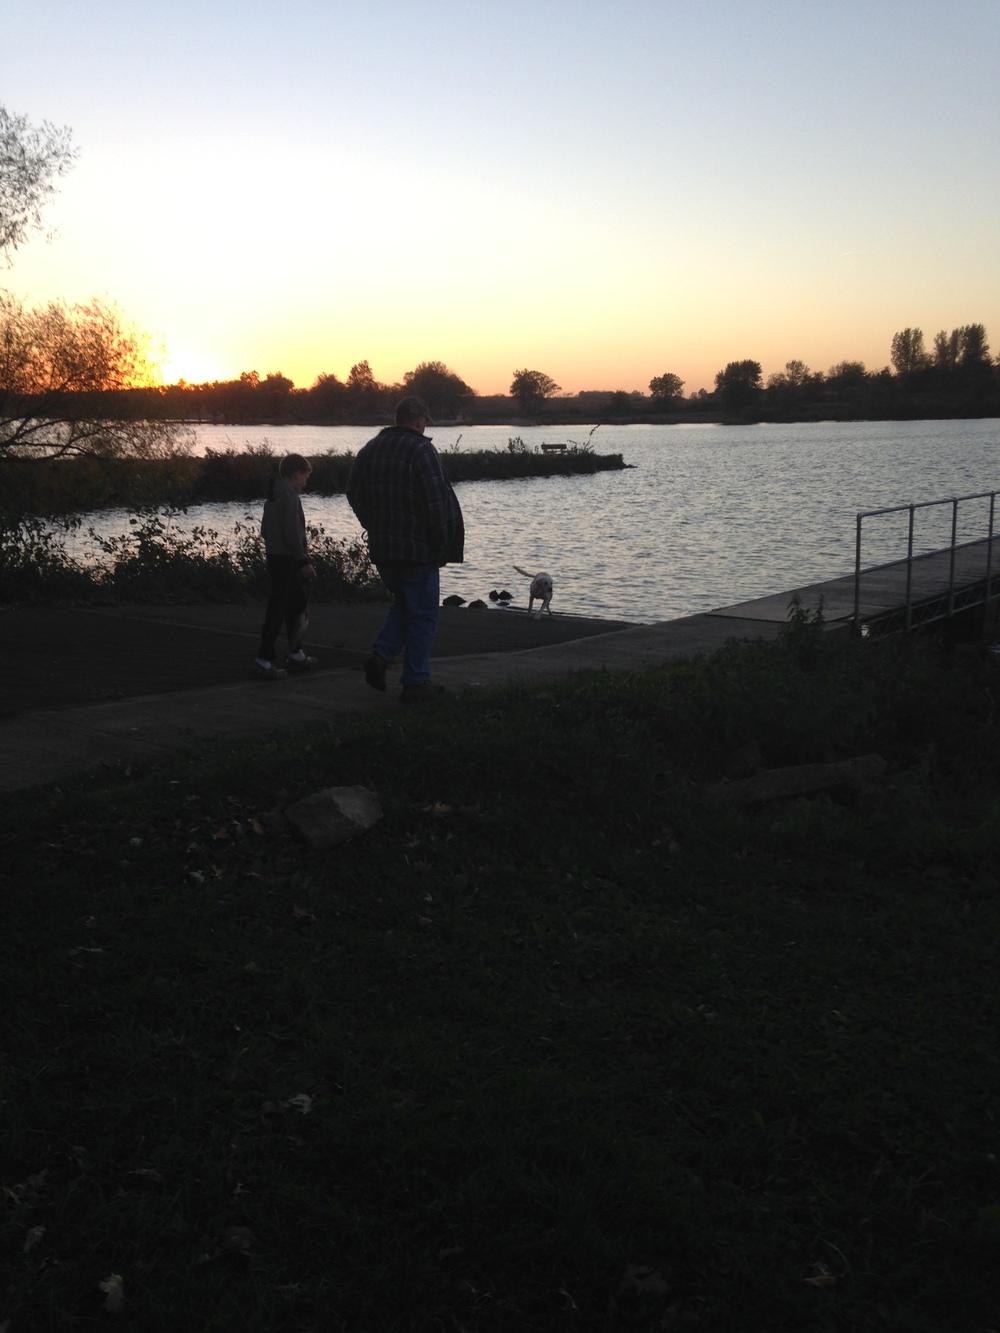 Ashlee-Family-at-the-Lake.jpg